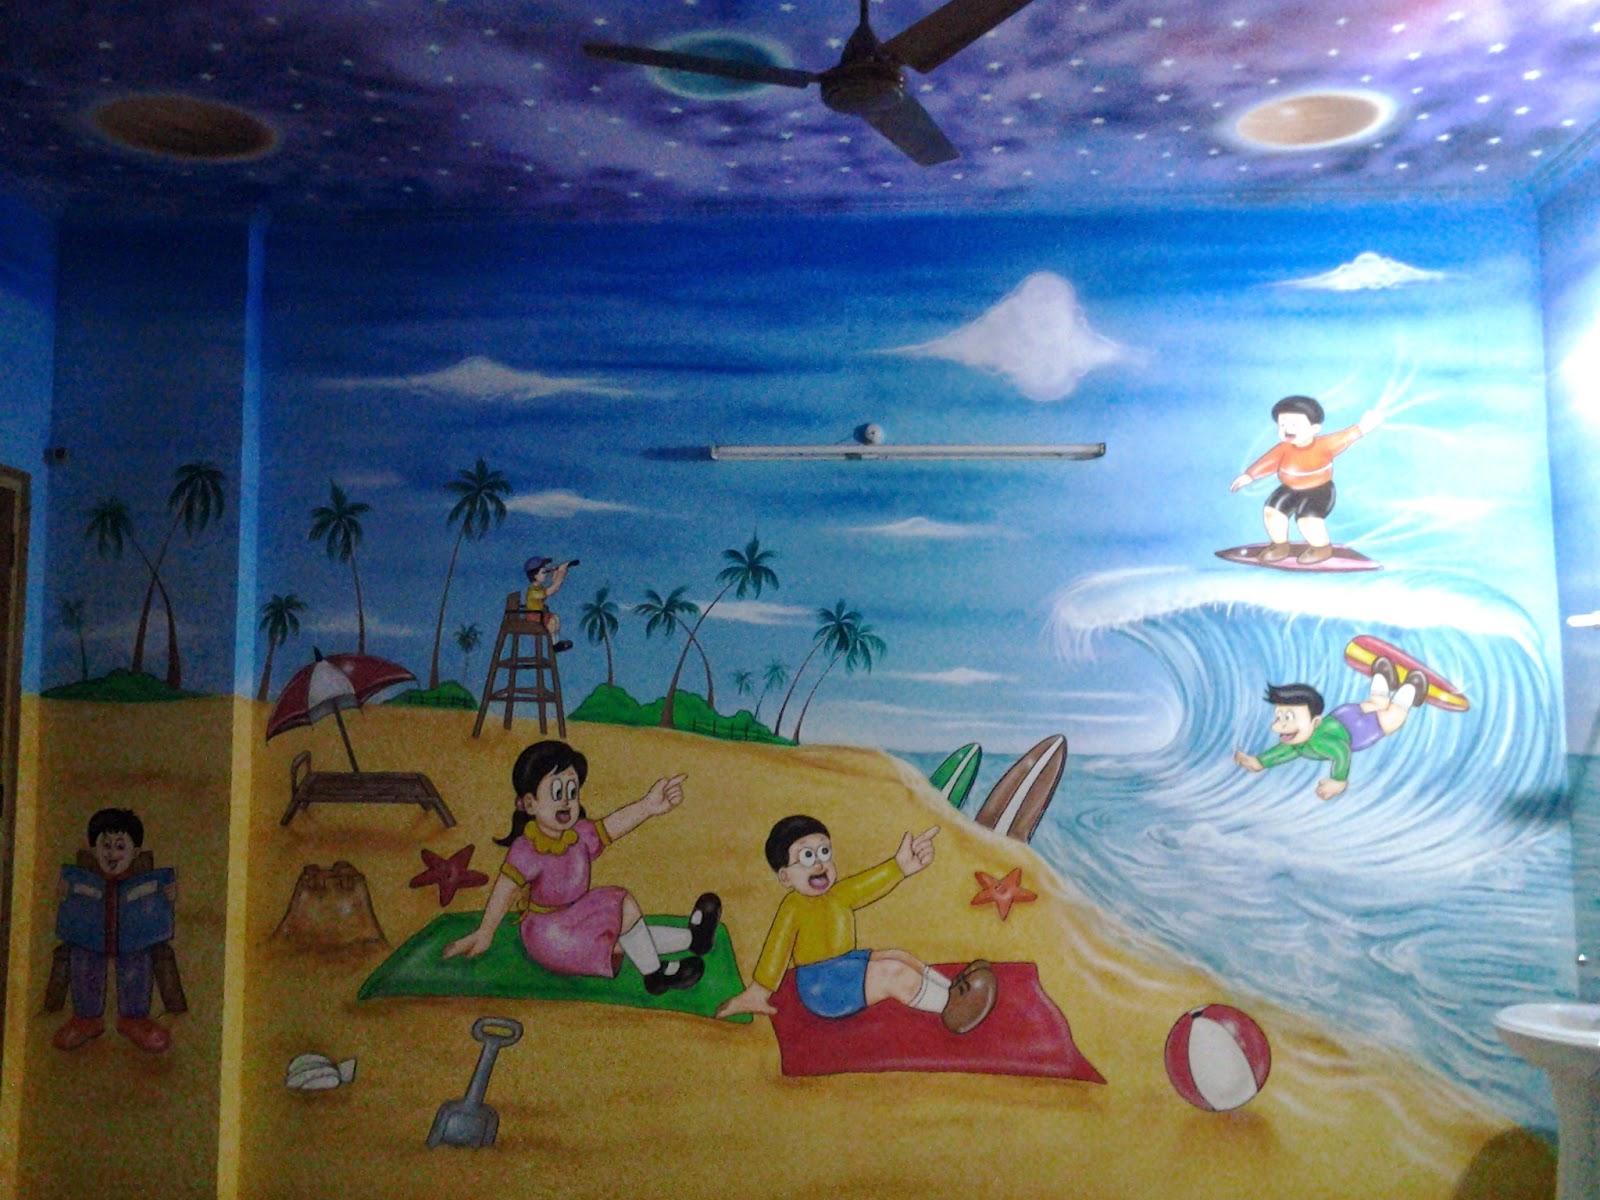 School Wall Painting Play School Wall Painting 3d Cartoon